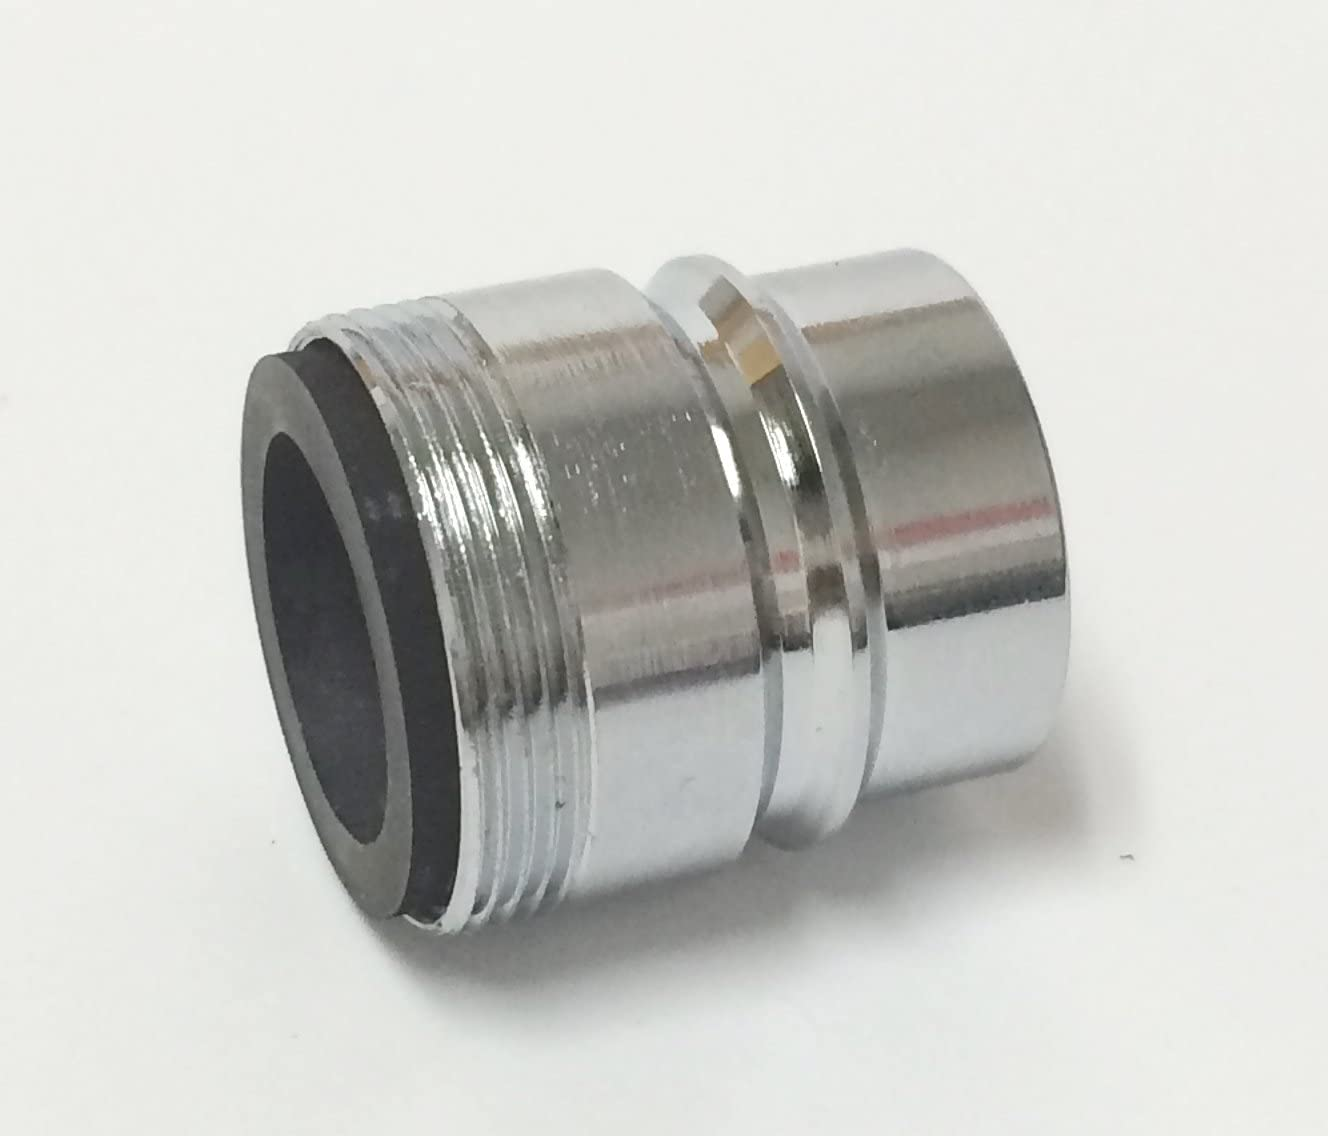 Product Plumb Pak Tampa Mall Faucet Aerator PP28009 Dishwasher Chrome for